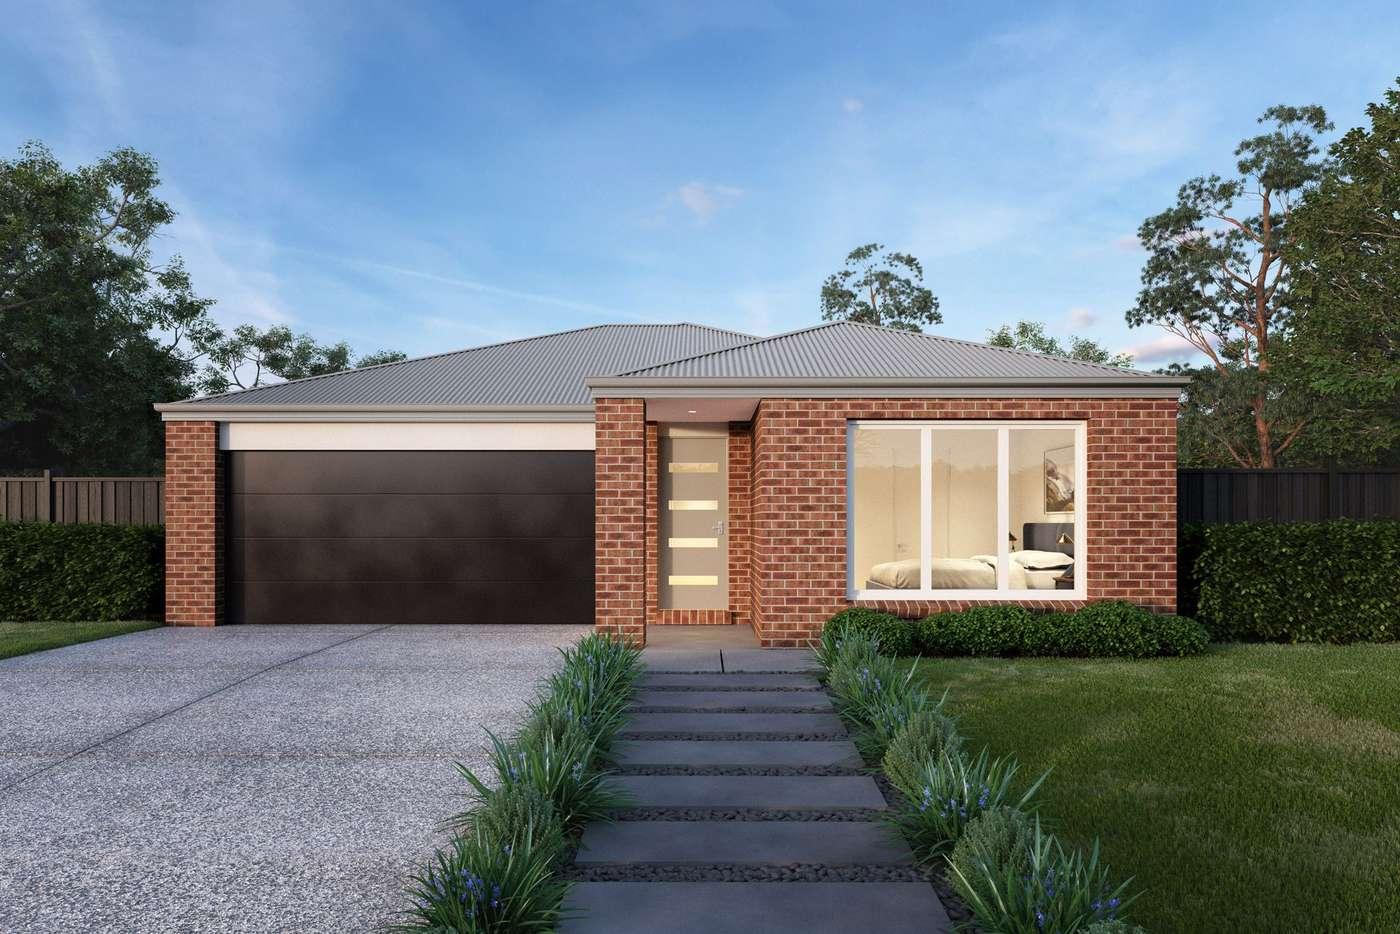 Main view of Homely house listing, 3/421 Walnut Avenue, Mildura VIC 3500